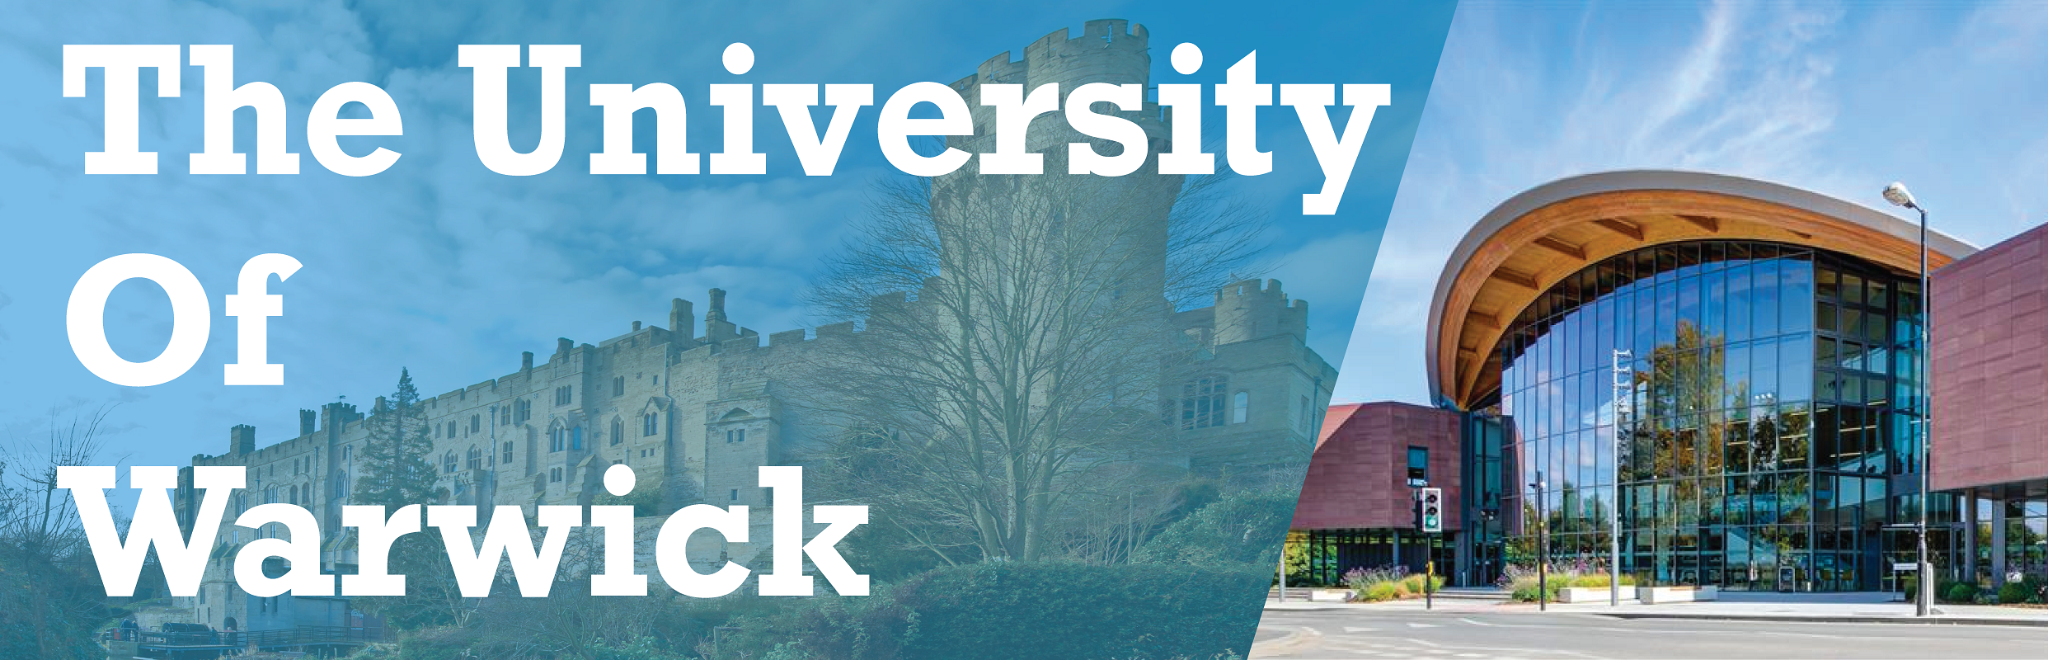 The University of Warwick - Banner